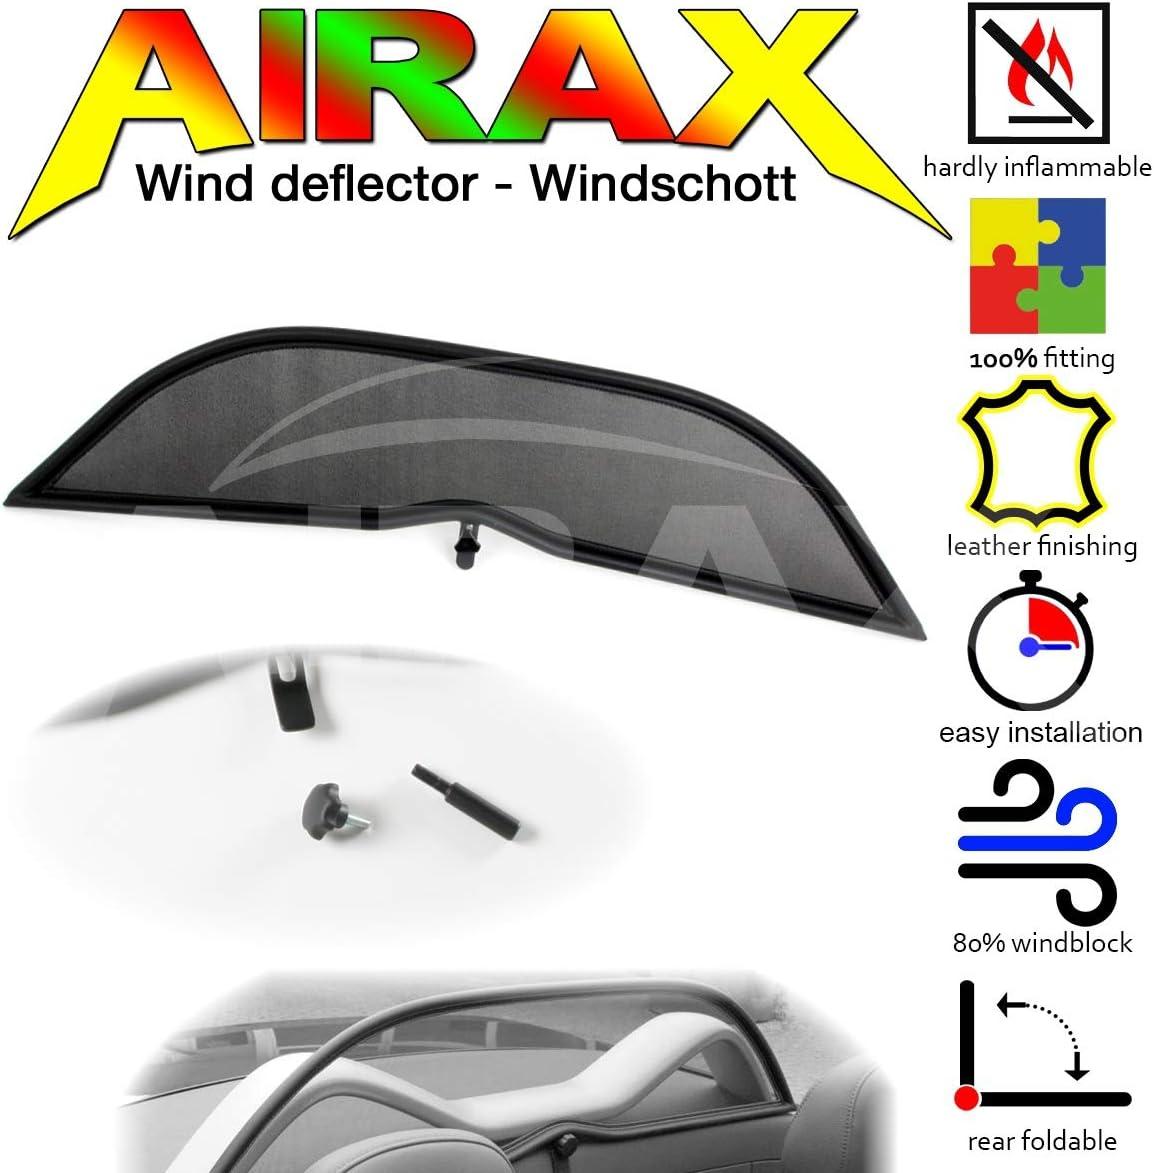 250 Airax Windschott f/ür TR 4 TR 5 TR 6 Windabweiser Windscherm Windstop Wind deflector d/éflecteur de vent IRS